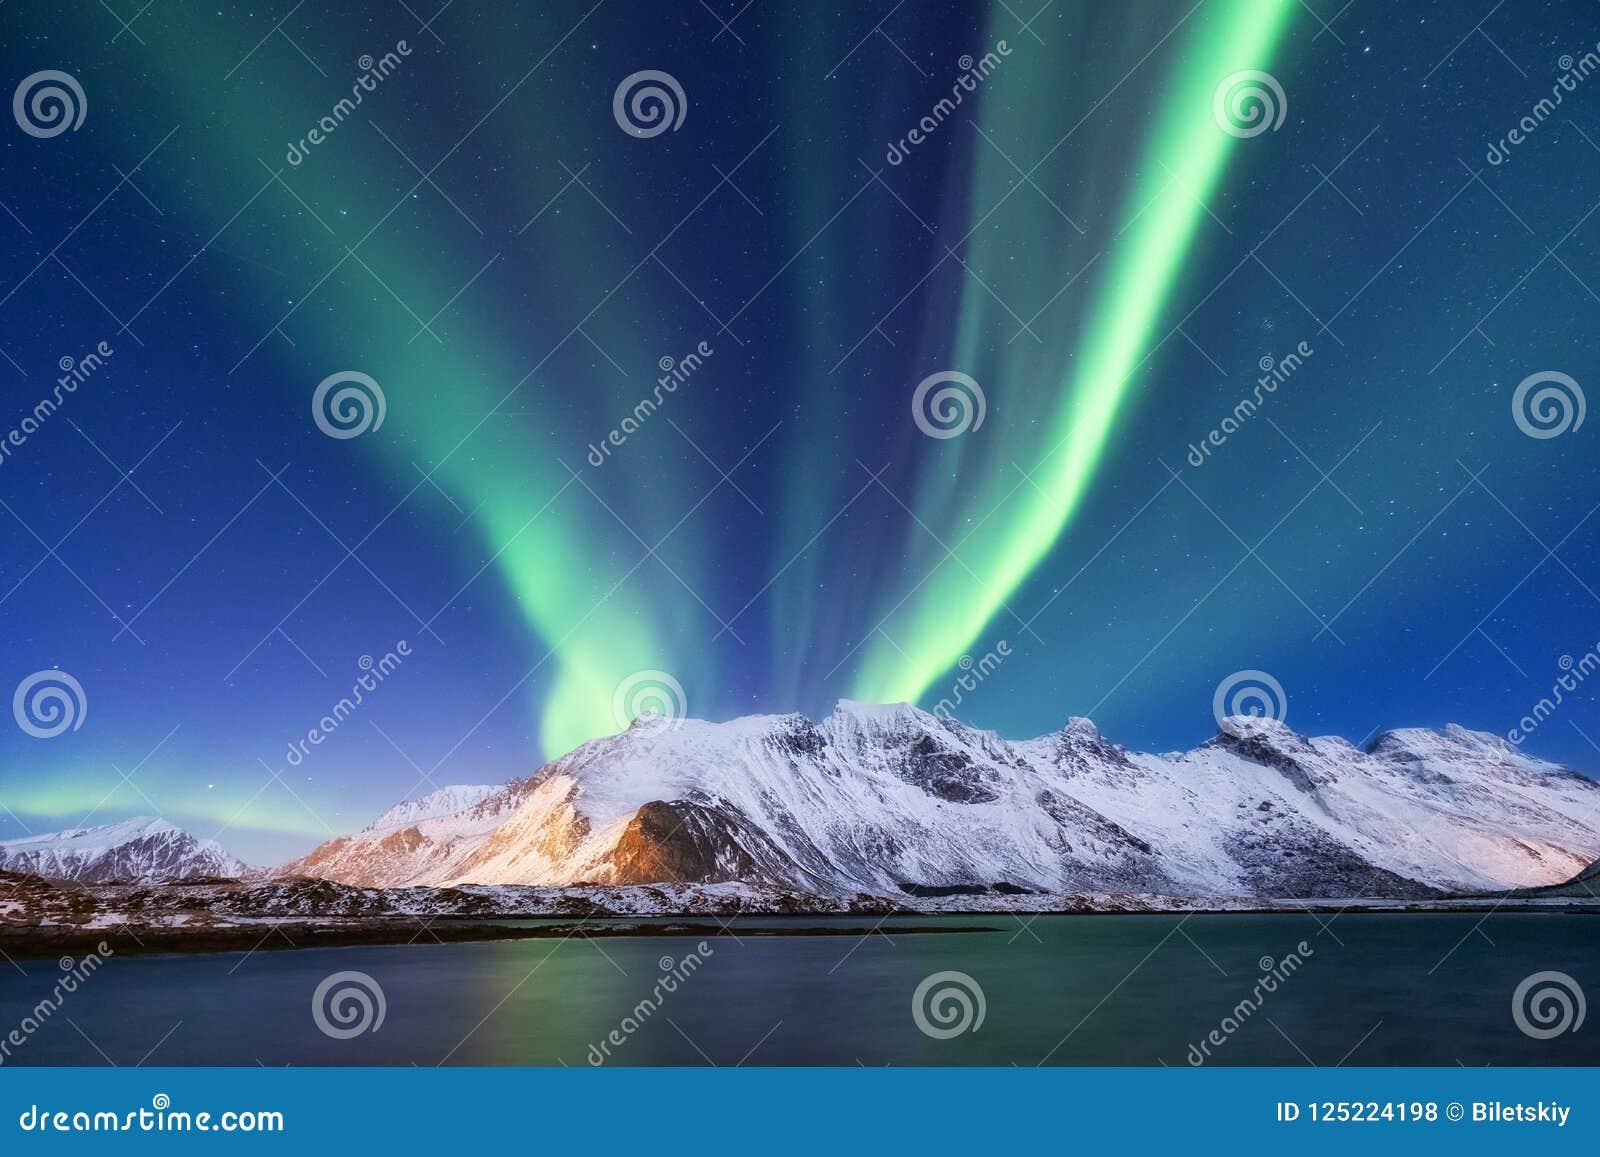 Aurora borealis on the Lofoten islands, Norway. Green northern lights above mountains.